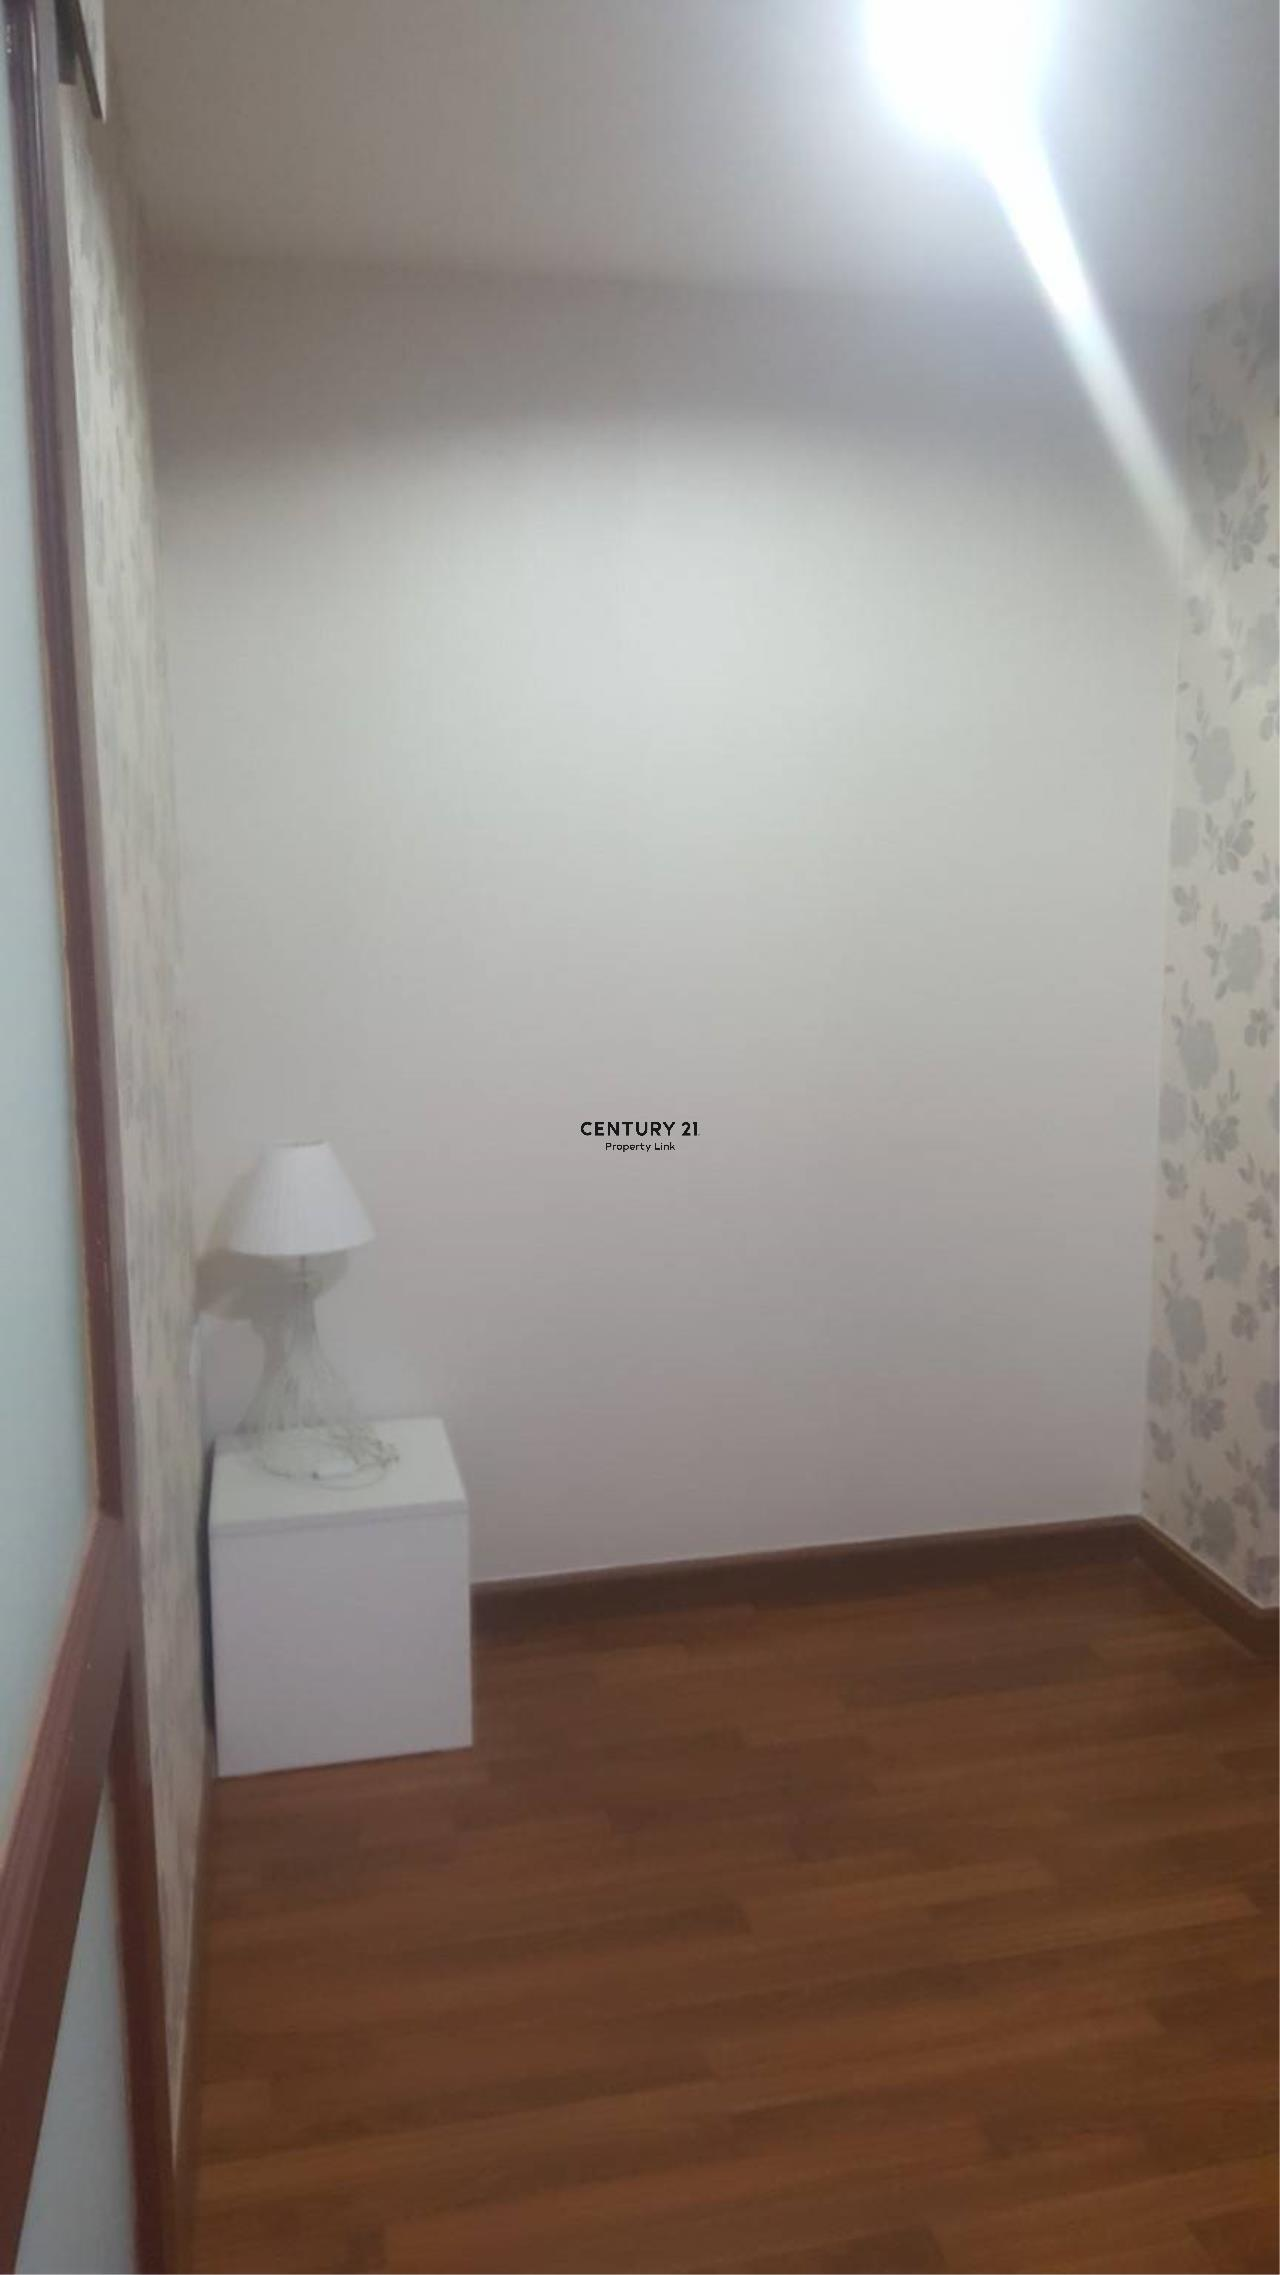 Century21 Property Link Agency's 39-CC-61595 PG Rama IX condo for Sale / Rent Condo Bangkok Near MRT RAMA 9 Sale Price 3M. / Rental 14,500 THB.  9